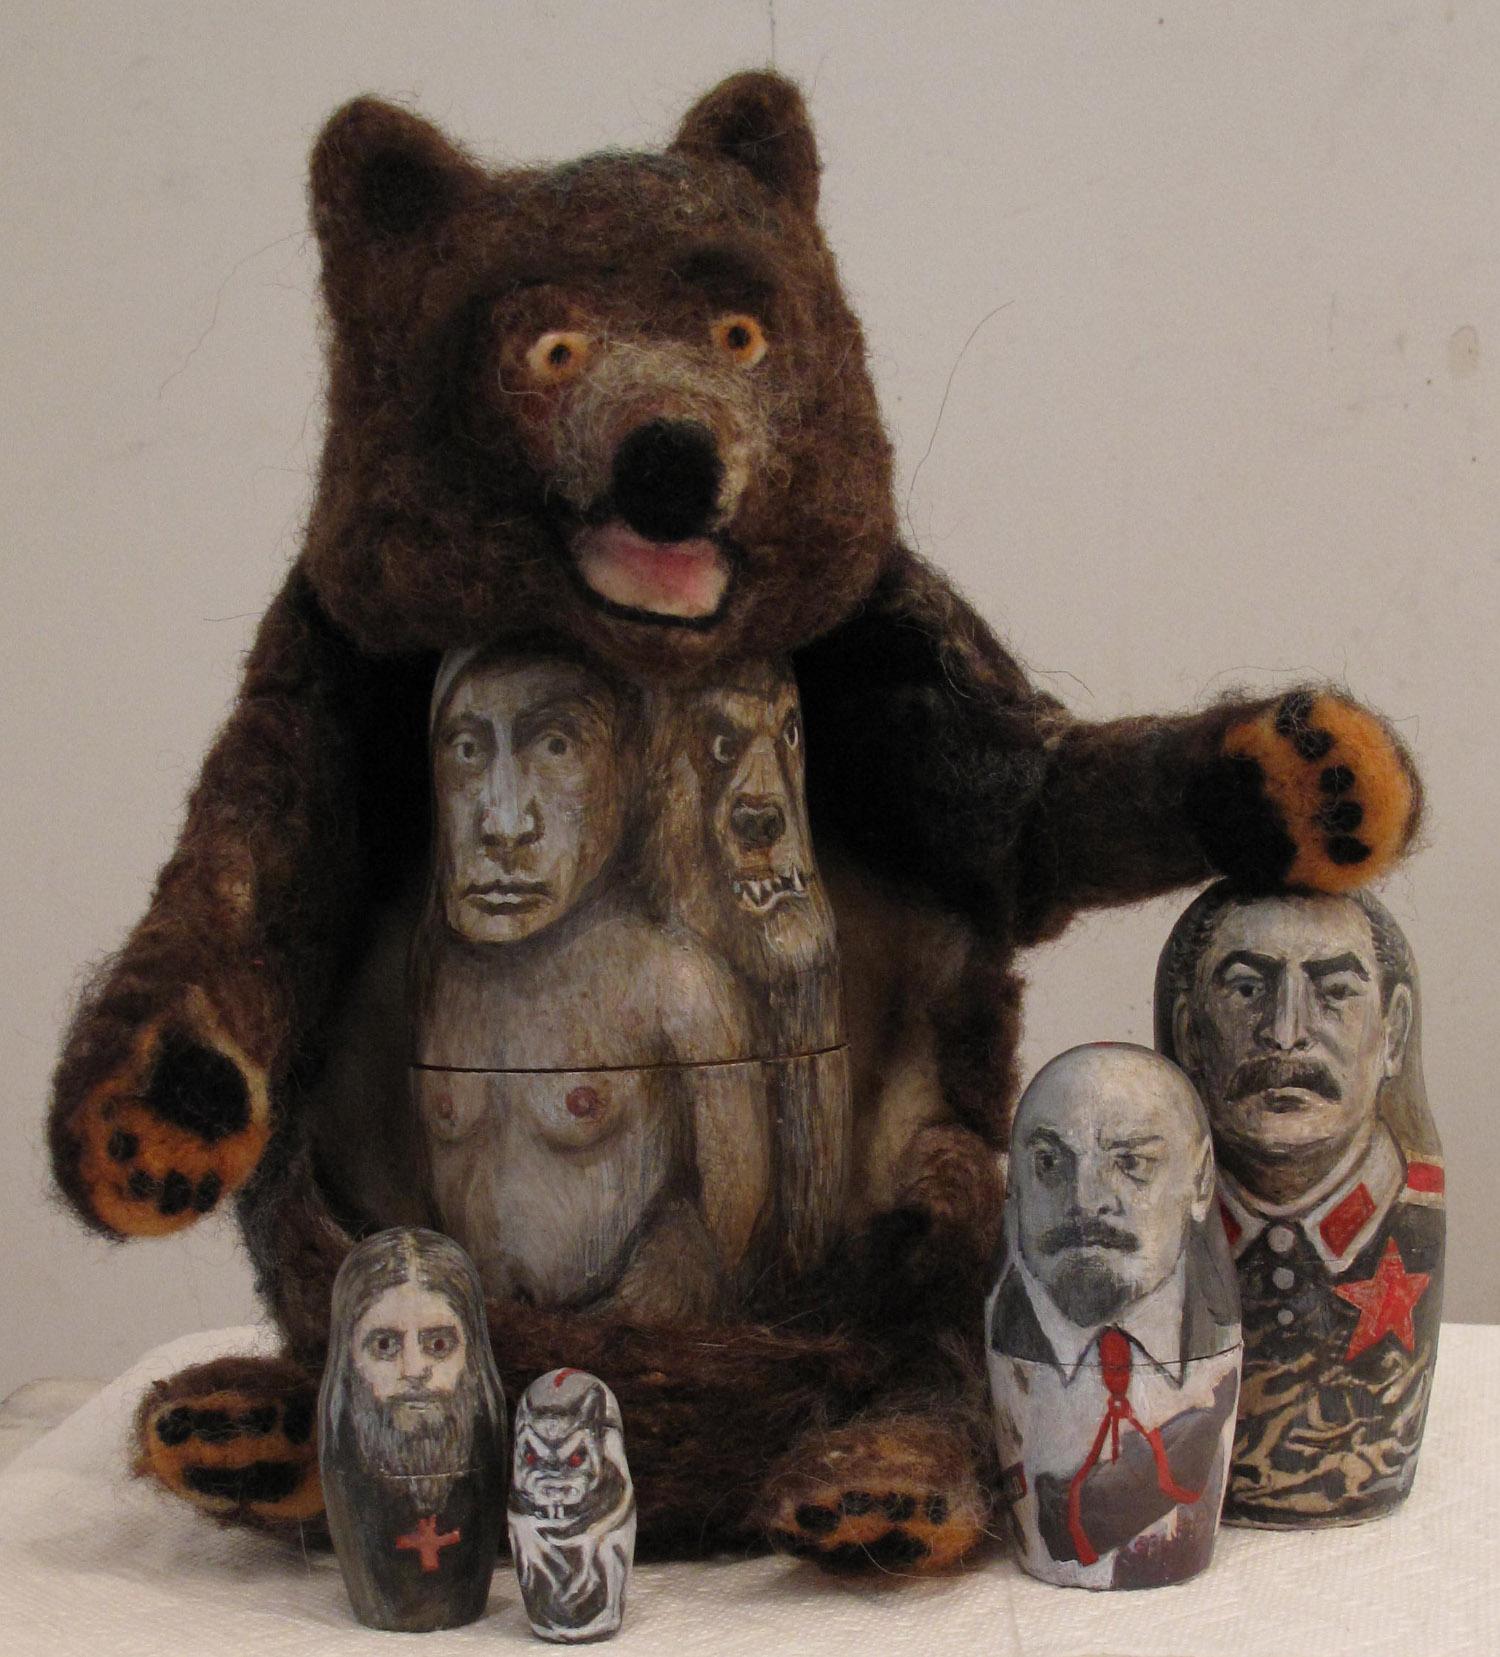 2be(0) - Bear (T)hugs - felted bear by Ann Sandberg, 5 wooden nesting dolls,mm- 10x14x6 in.- 2015.jpg